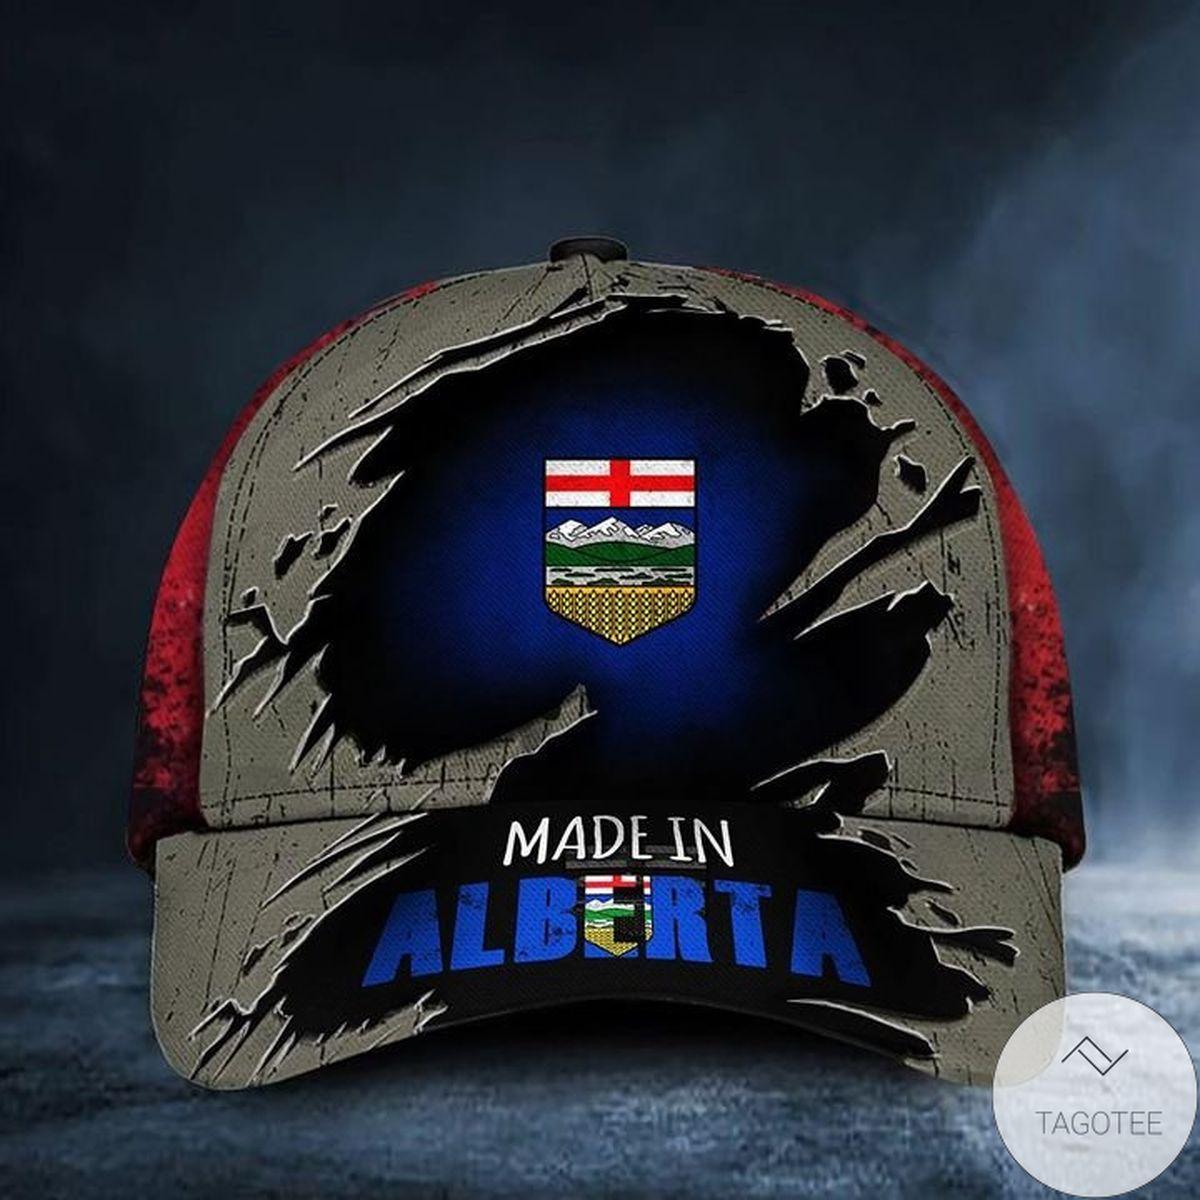 Made In Alberta Canada Flag Hat Old Retro Patriotic Proud From Alberta Province Man Cap